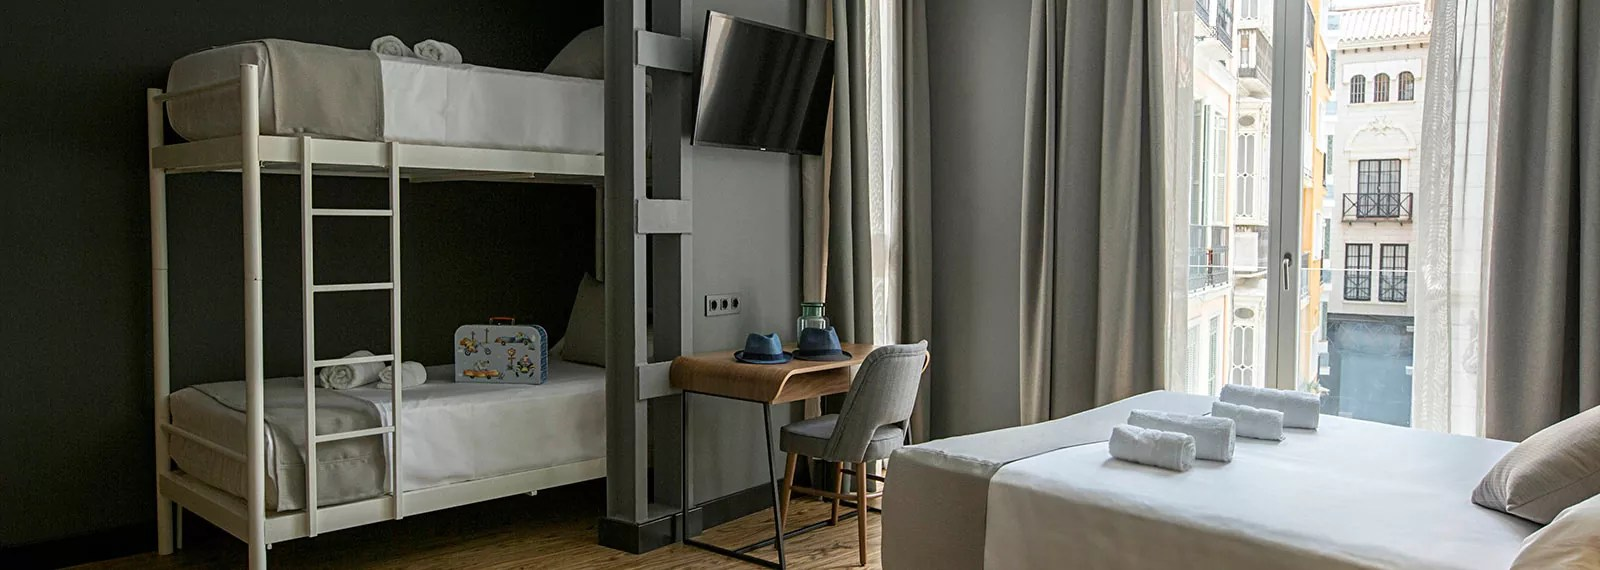 Hotel boutique Habitacin familiar en Mlaga Premium Hotel